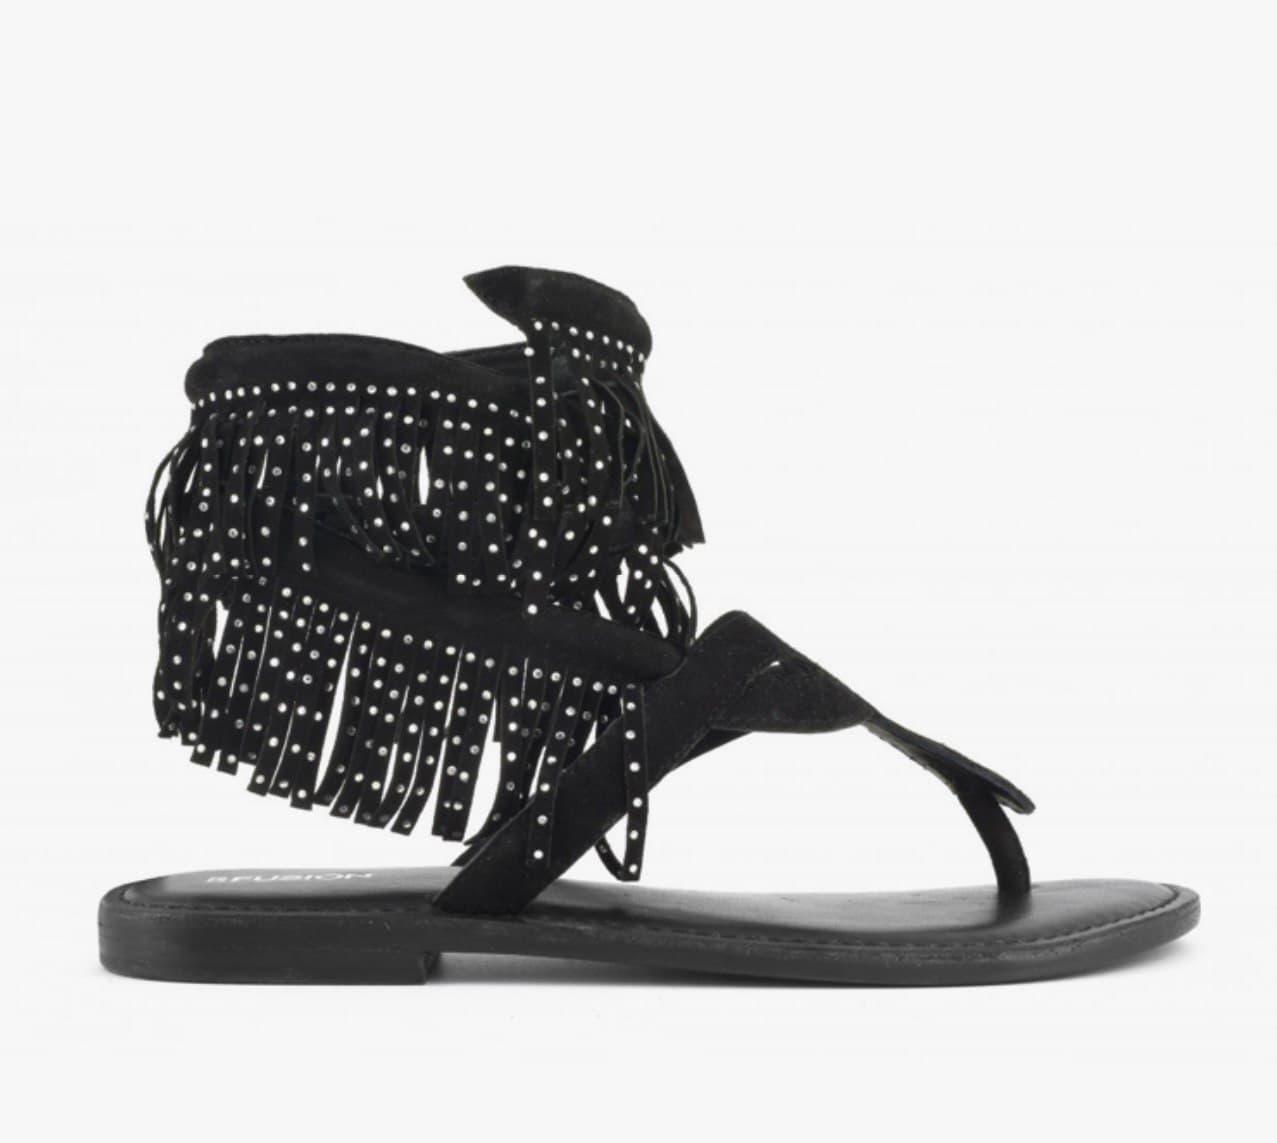 schiava nabuk frange strass CB FUSION | Sandalo | R221003BL